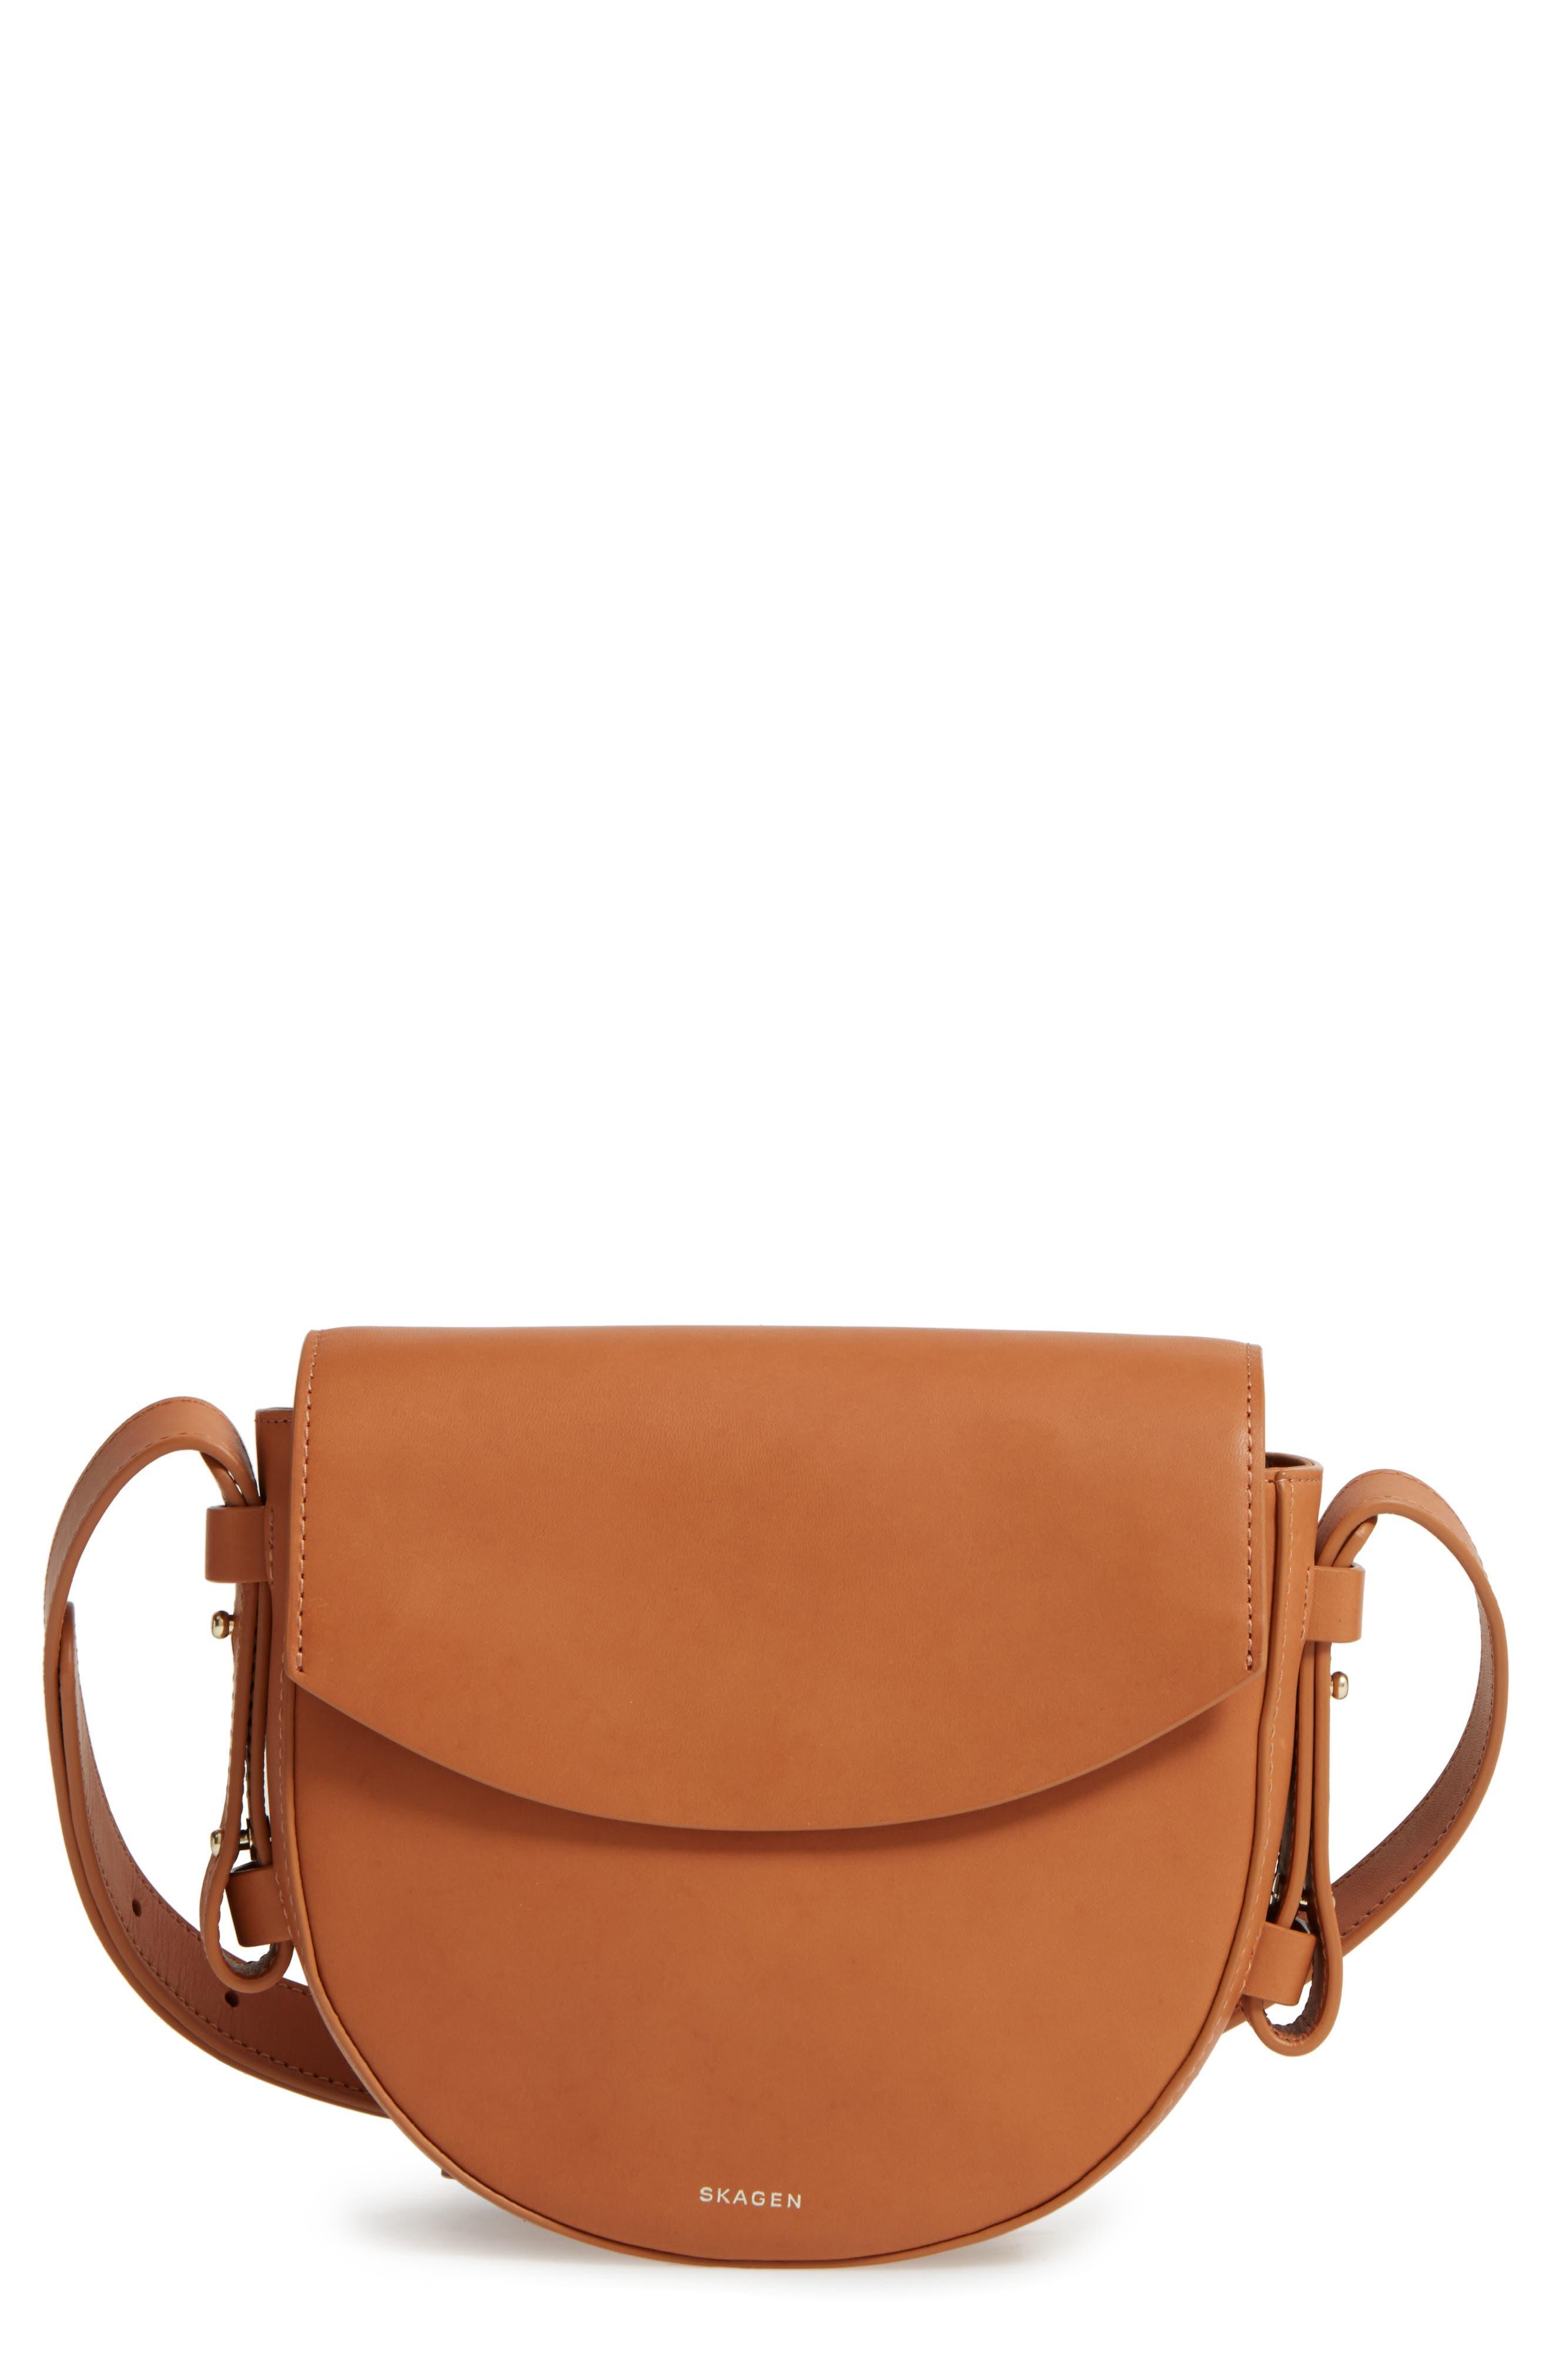 Lobelle Leather Saddle Bag,                             Main thumbnail 1, color,                             Tan